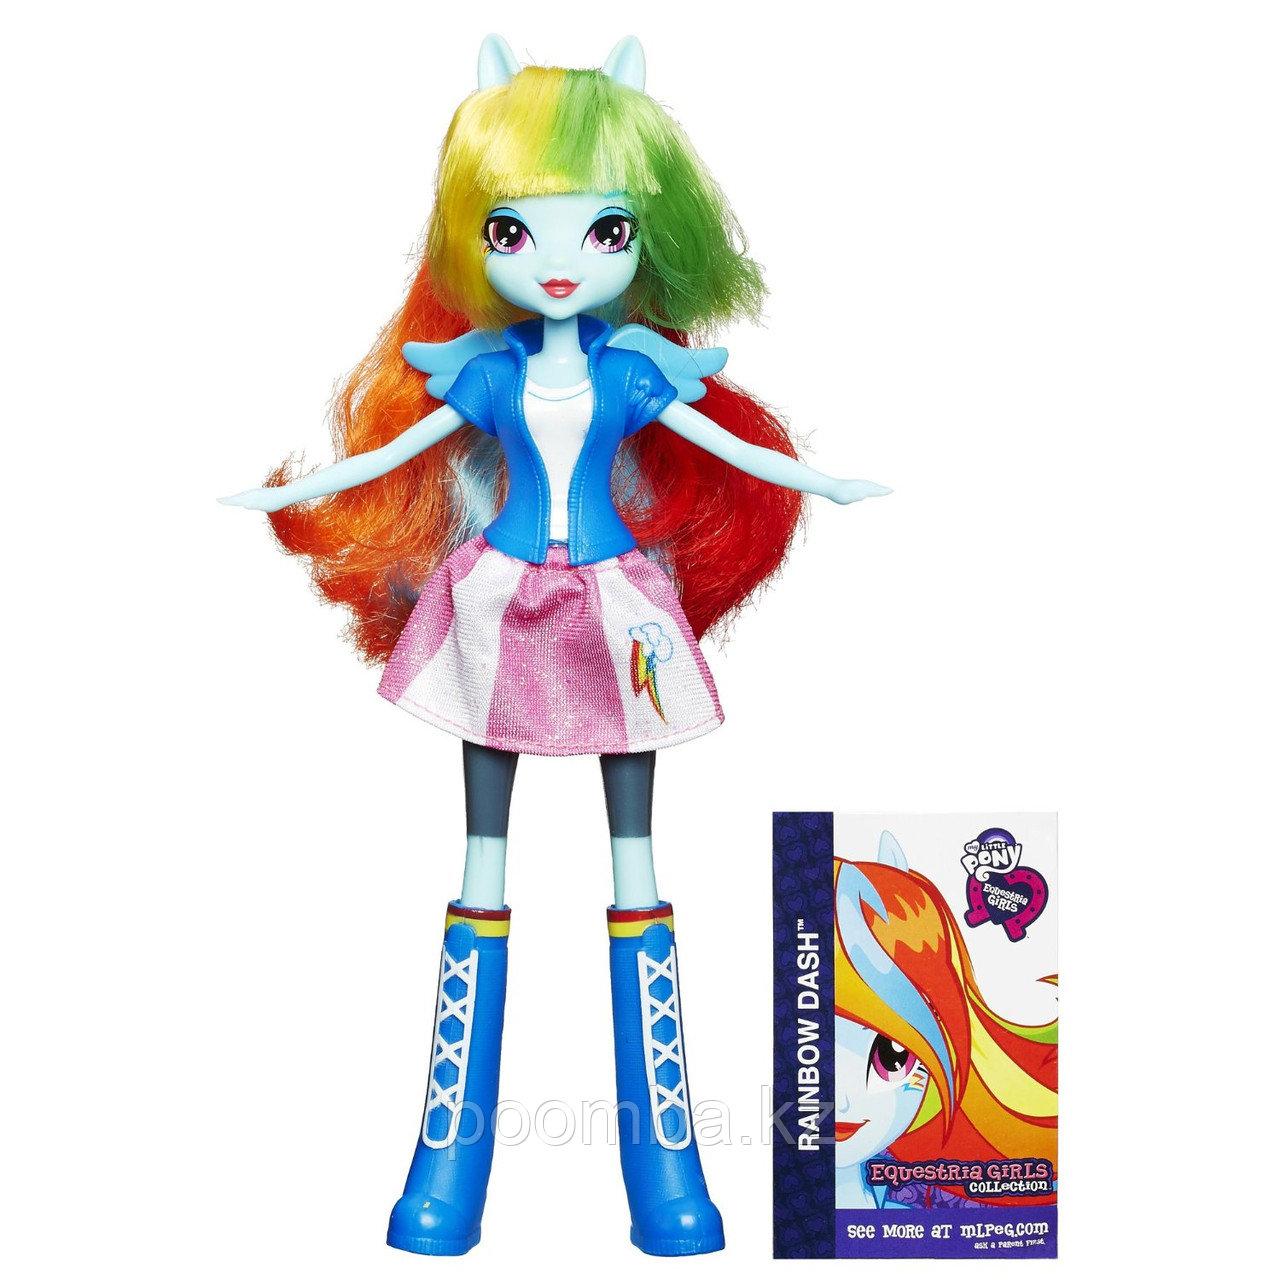 Кукла My Little Pony Equestria Girls - Рэйнбоу Дэш в синих сапожках